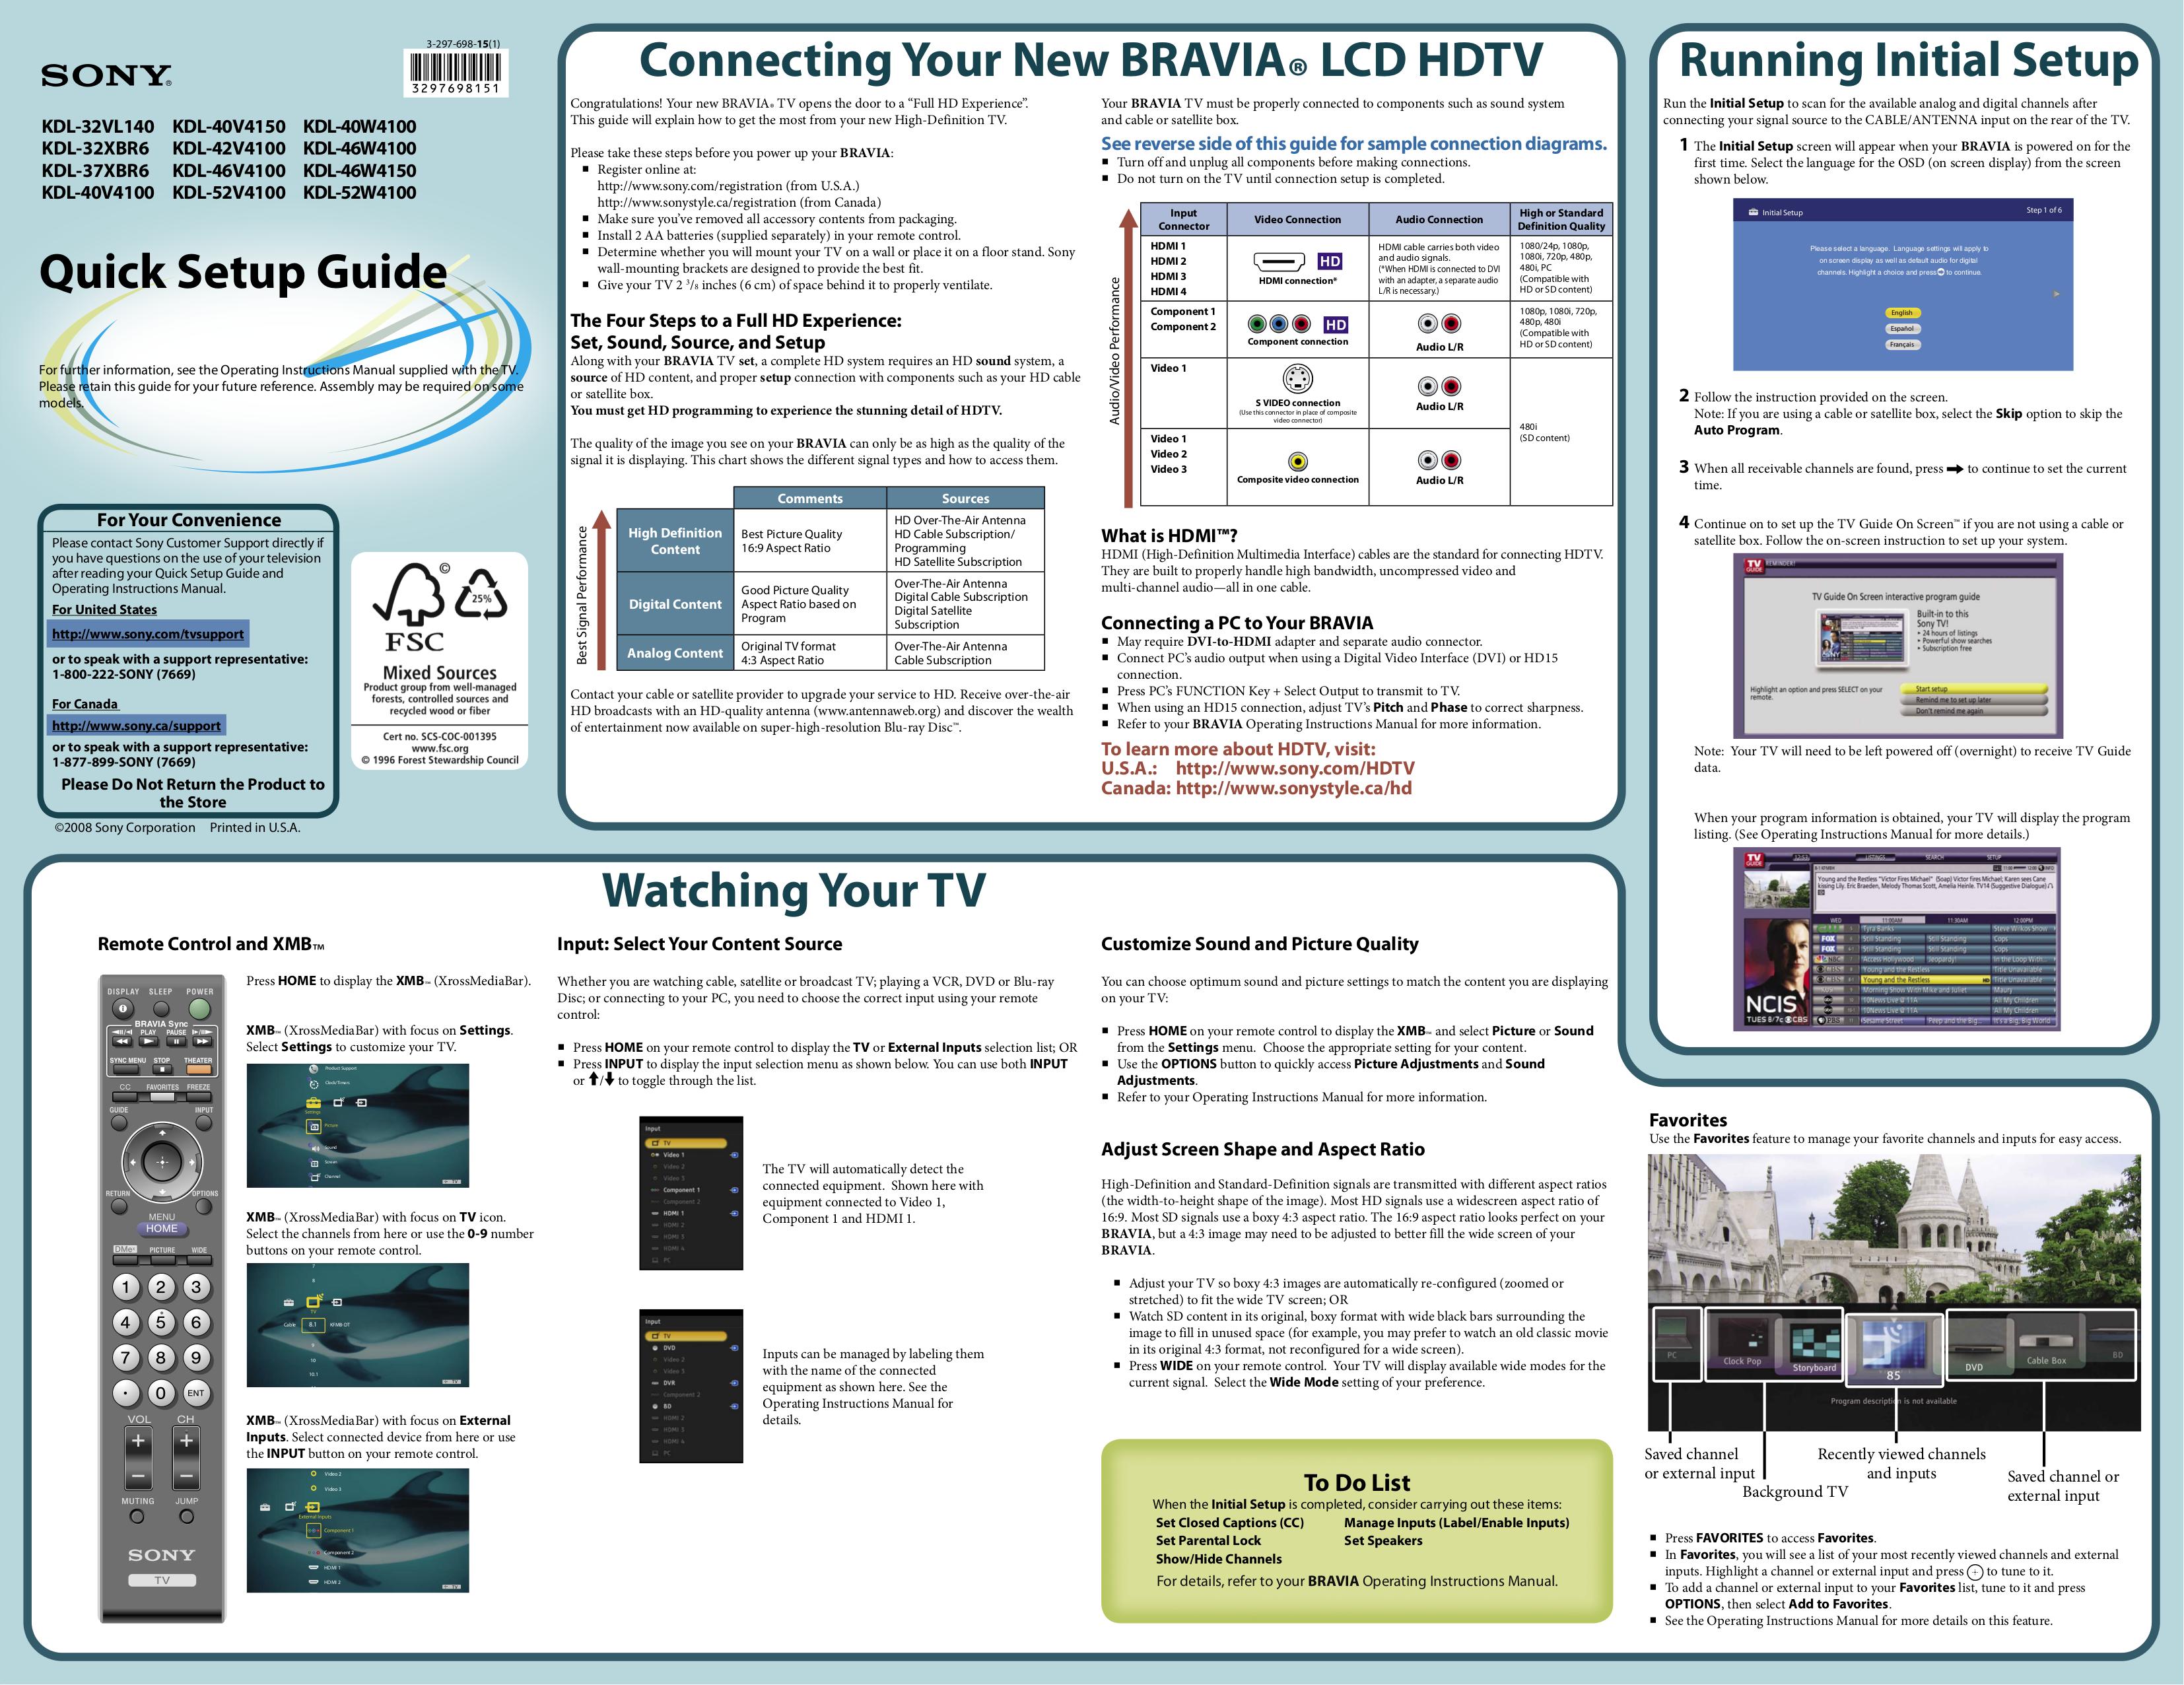 download free pdf for sony bravia kdl 52w4100 tv manual rh umlib com Sony KDL-52W4100 Plug sony bravia kdl-52w4100 user manual